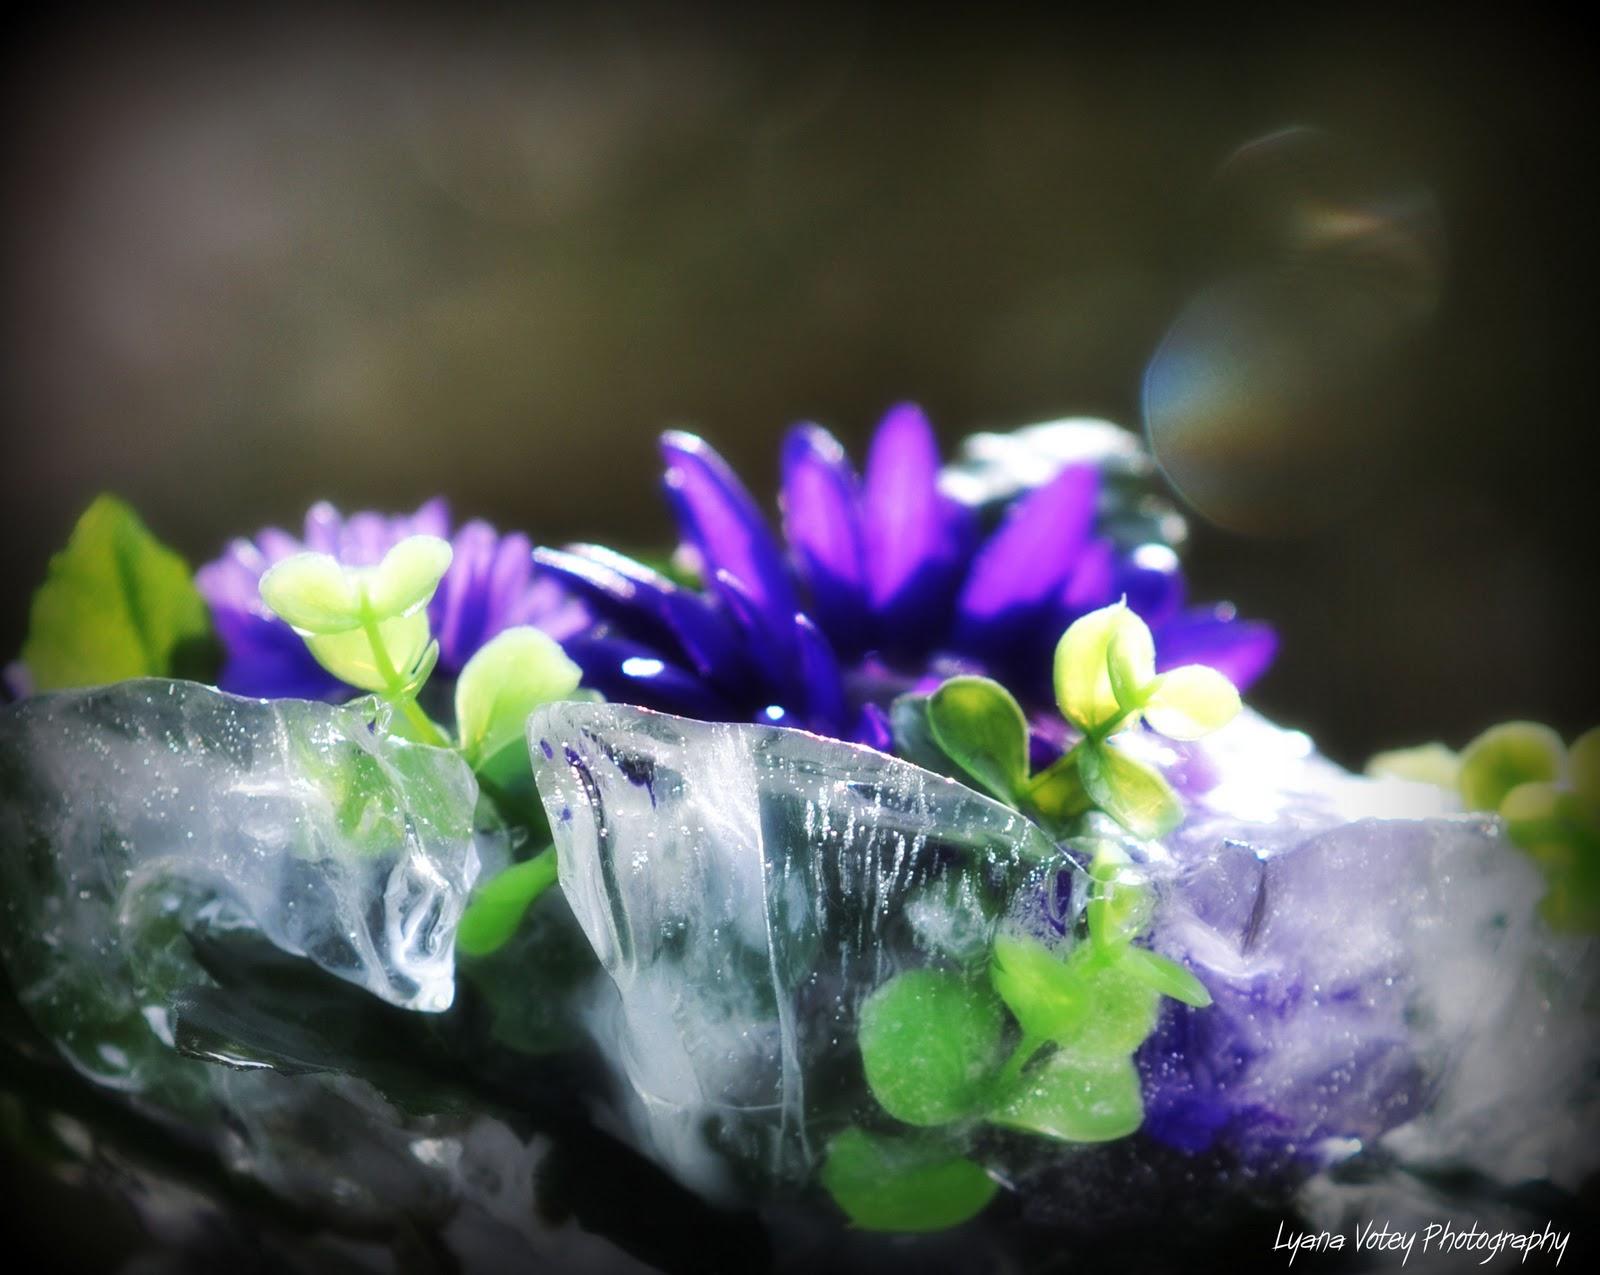 http://3.bp.blogspot.com/-Iyv3Fb6a2nI/TZf1Yo6ptCI/AAAAAAAAATY/u3boj_5kgg8/s1600/floral-ice-sculpture.jpg